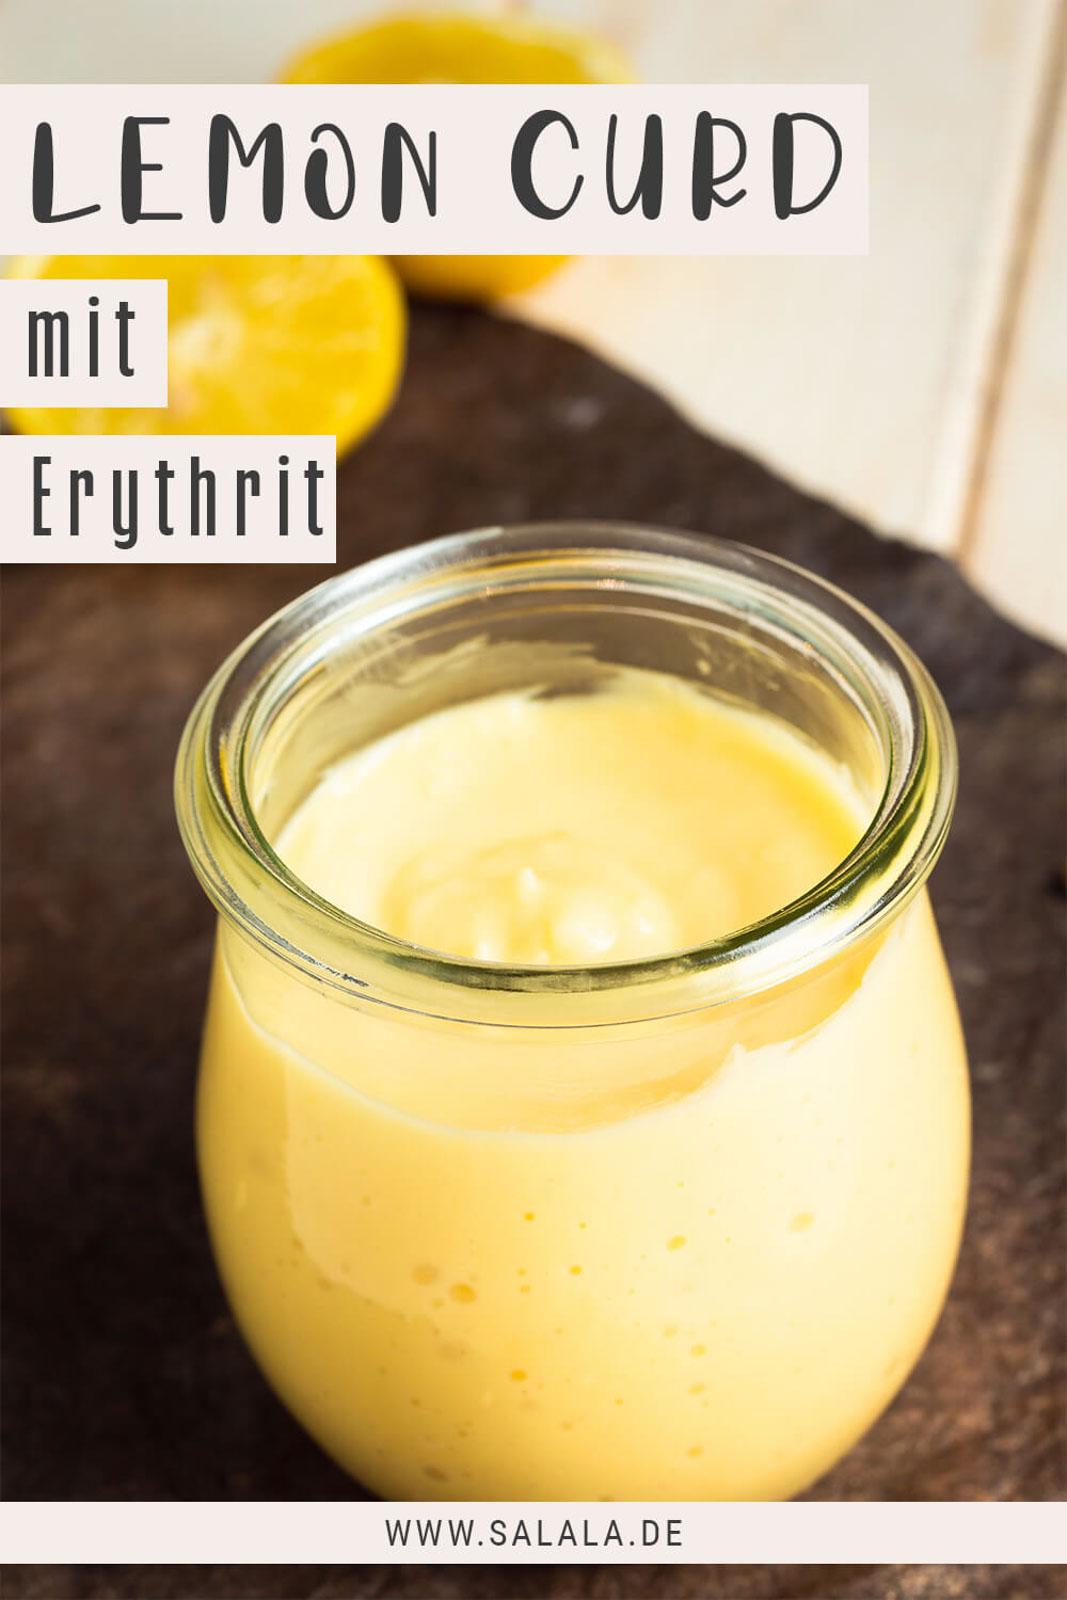 Lemon Curd mit Erythrit Keto Zitronencreme